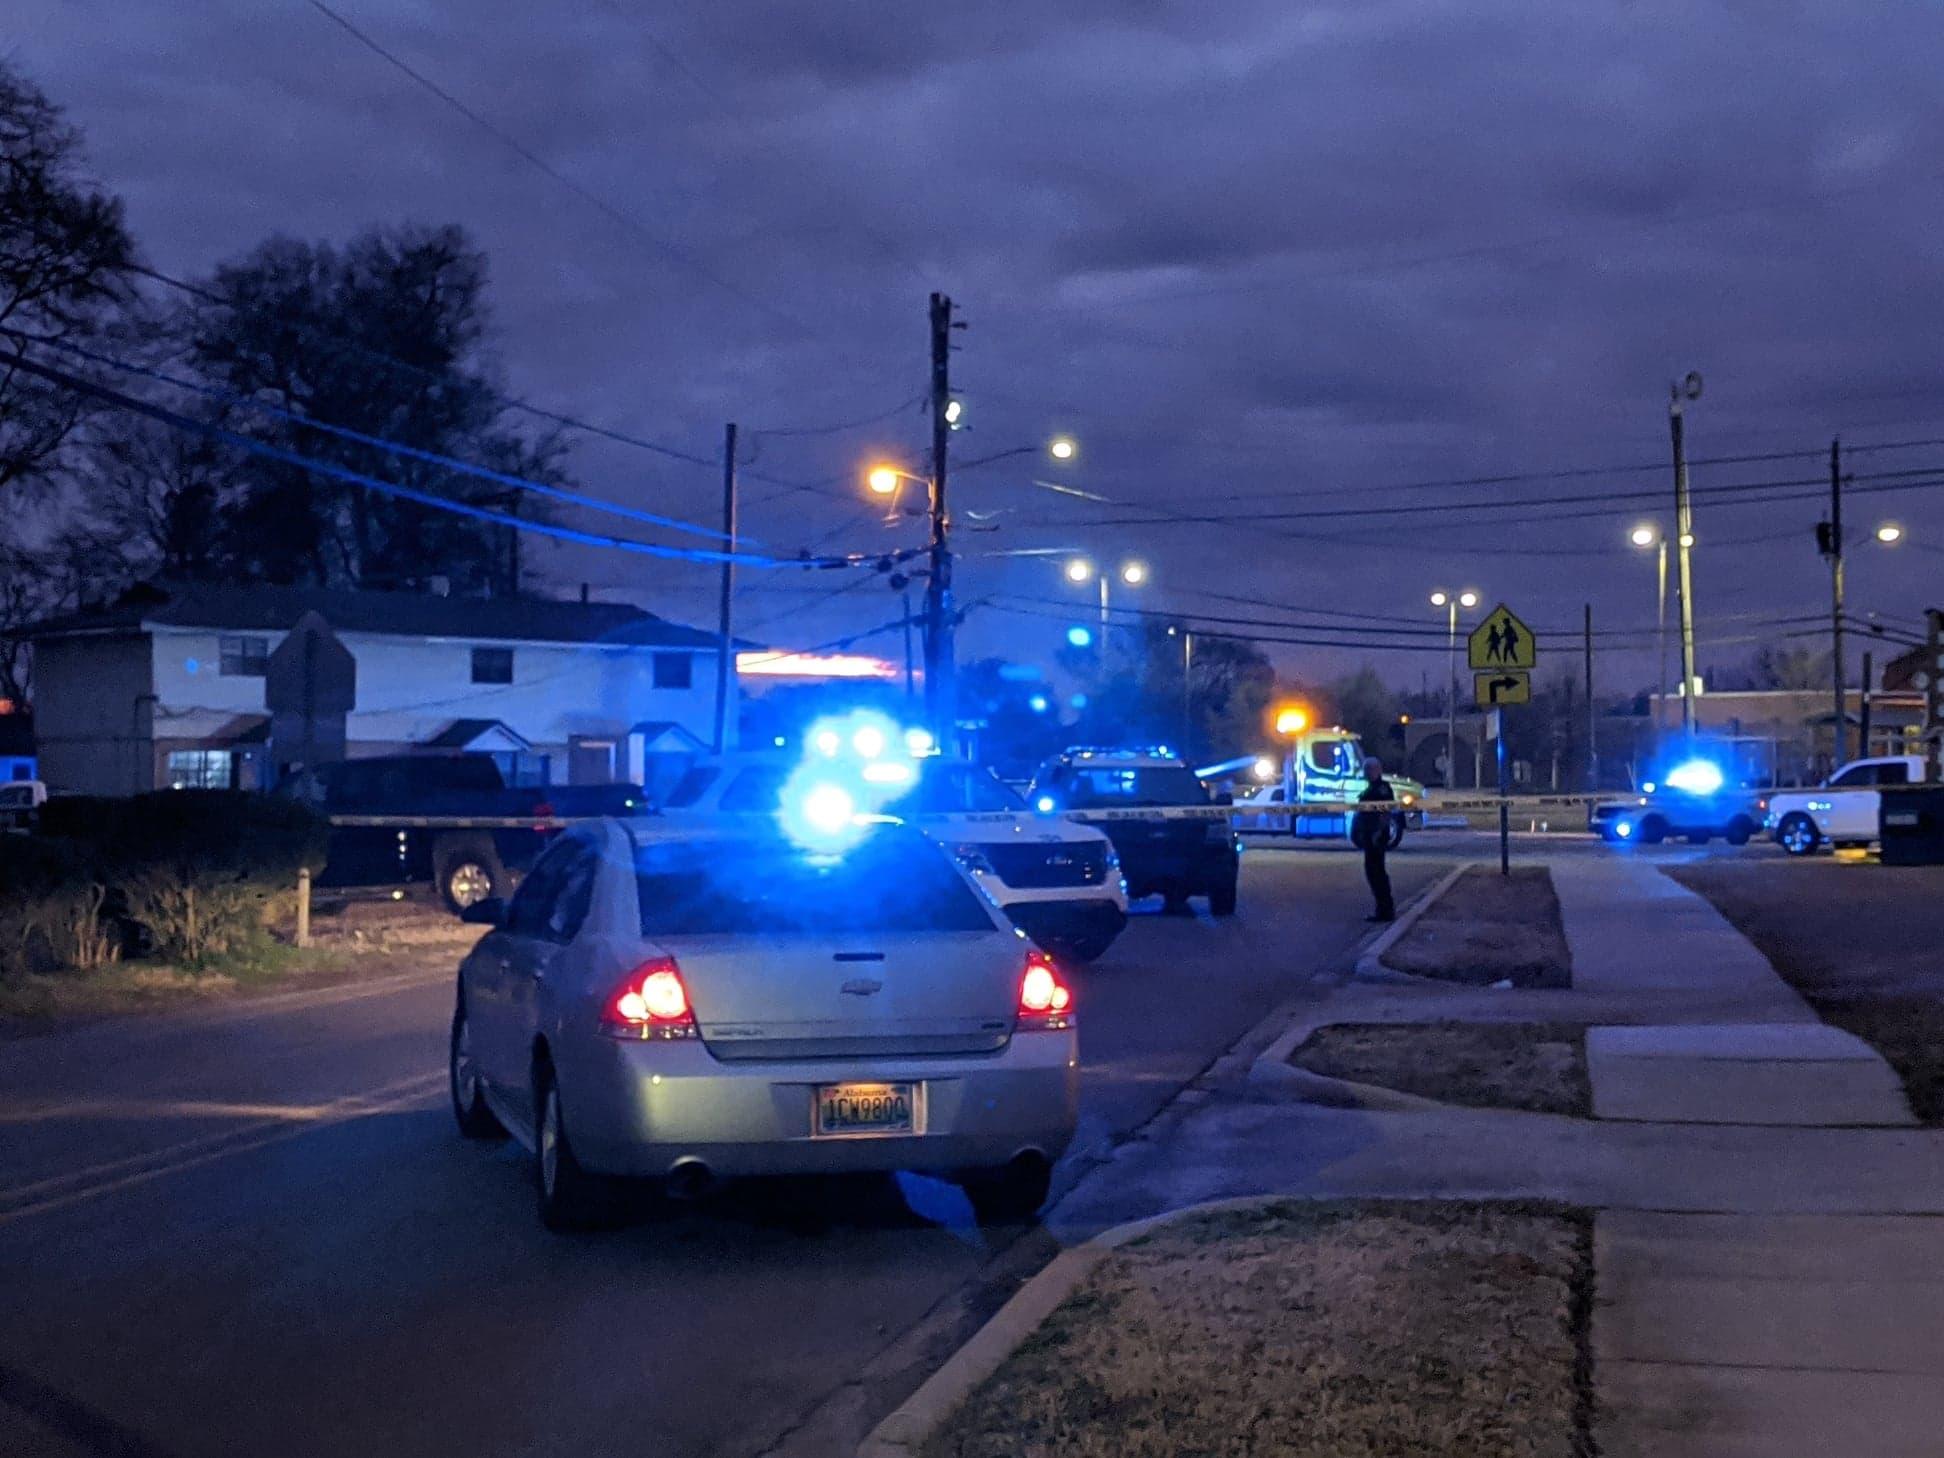 5-year-old shot, killed in Birmingham, suspect in custody